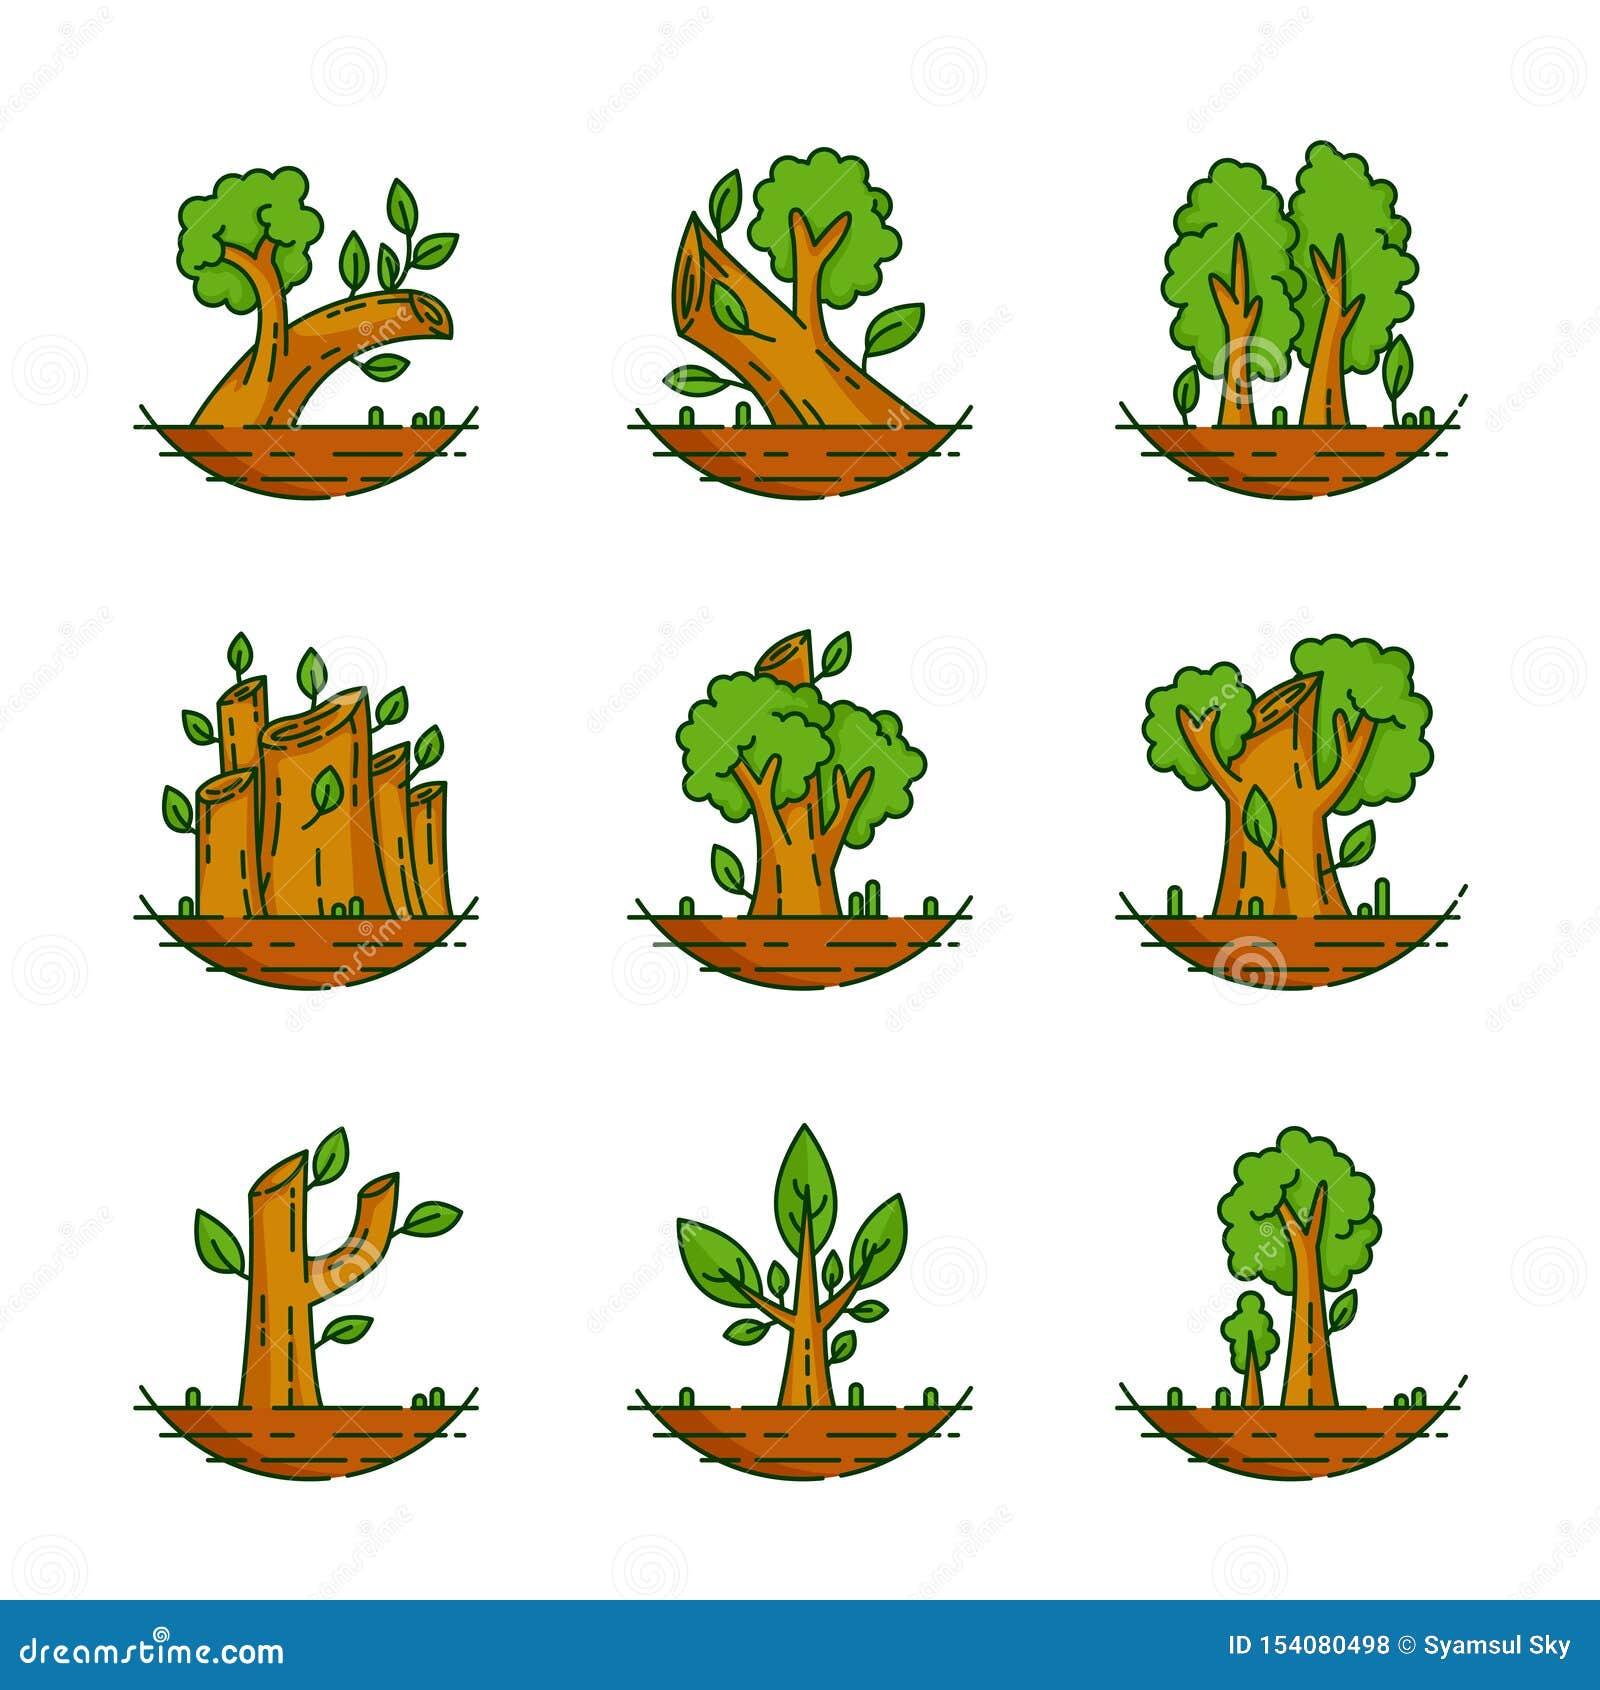 Arbre, usine, forêt, nature, illustration botanique, collection d arbres